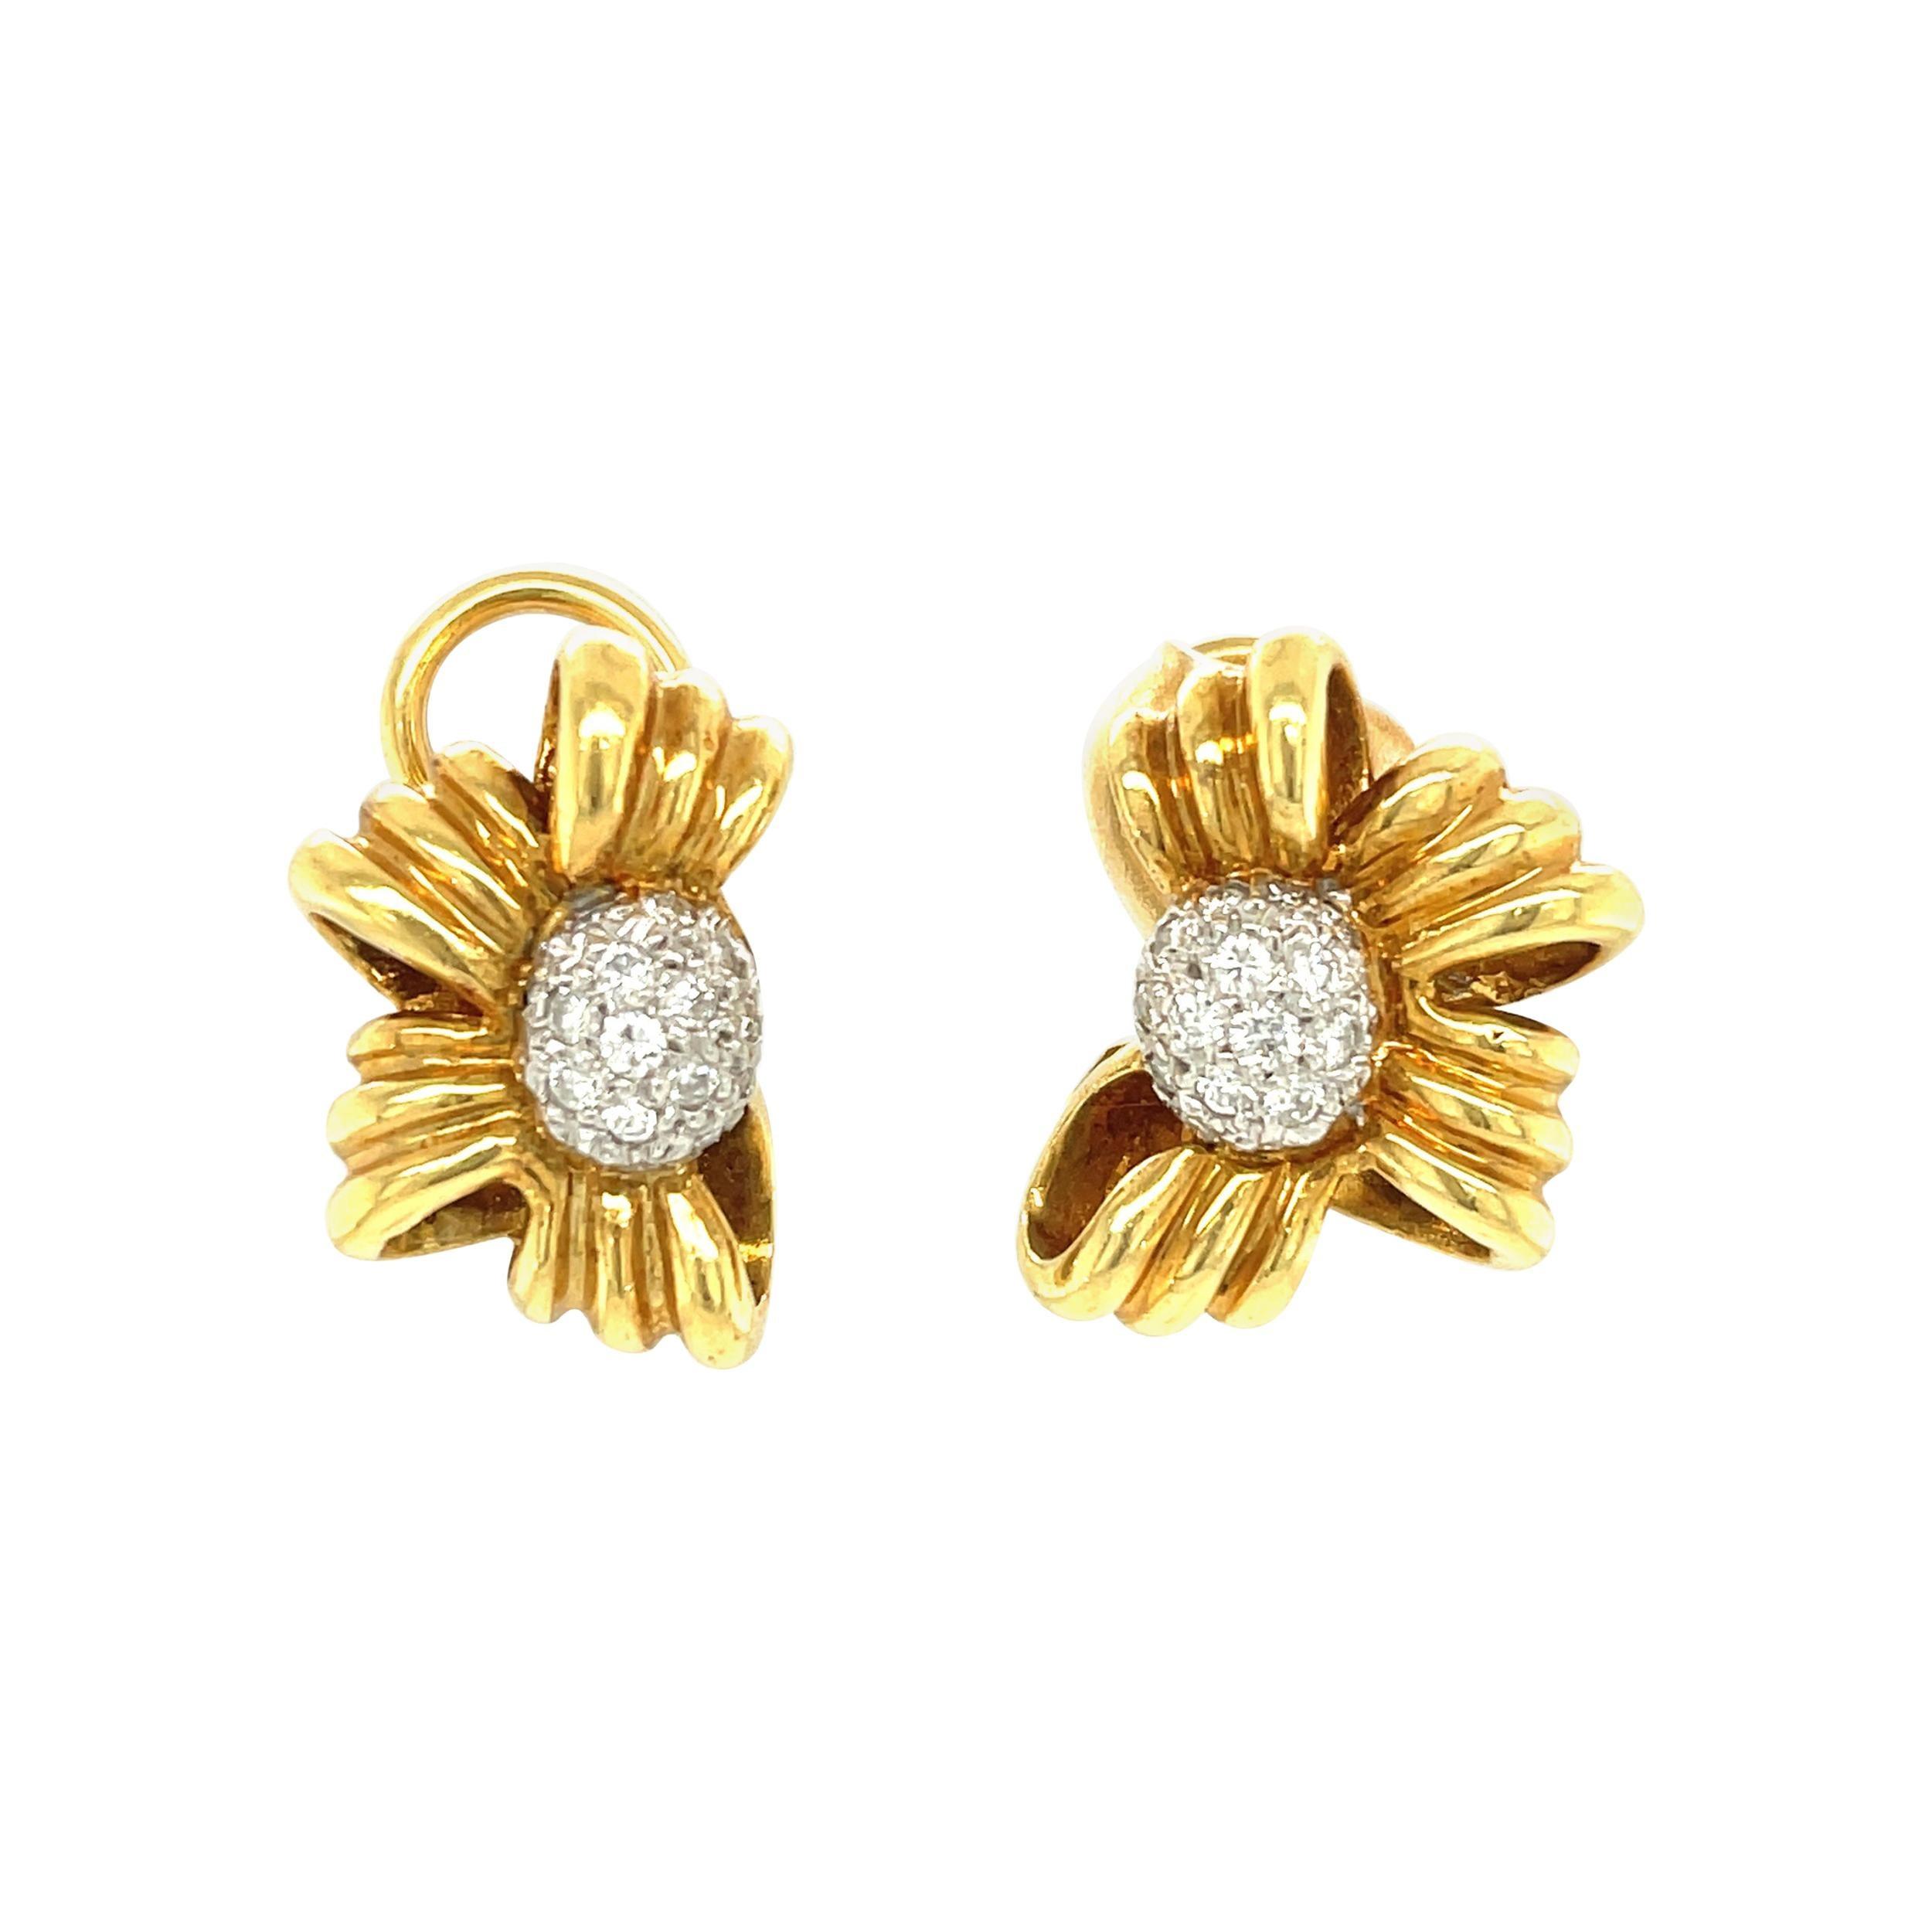 Vintage Tiffany & Co. 18 Karat Yellow Gold Diamond Bow Earrings